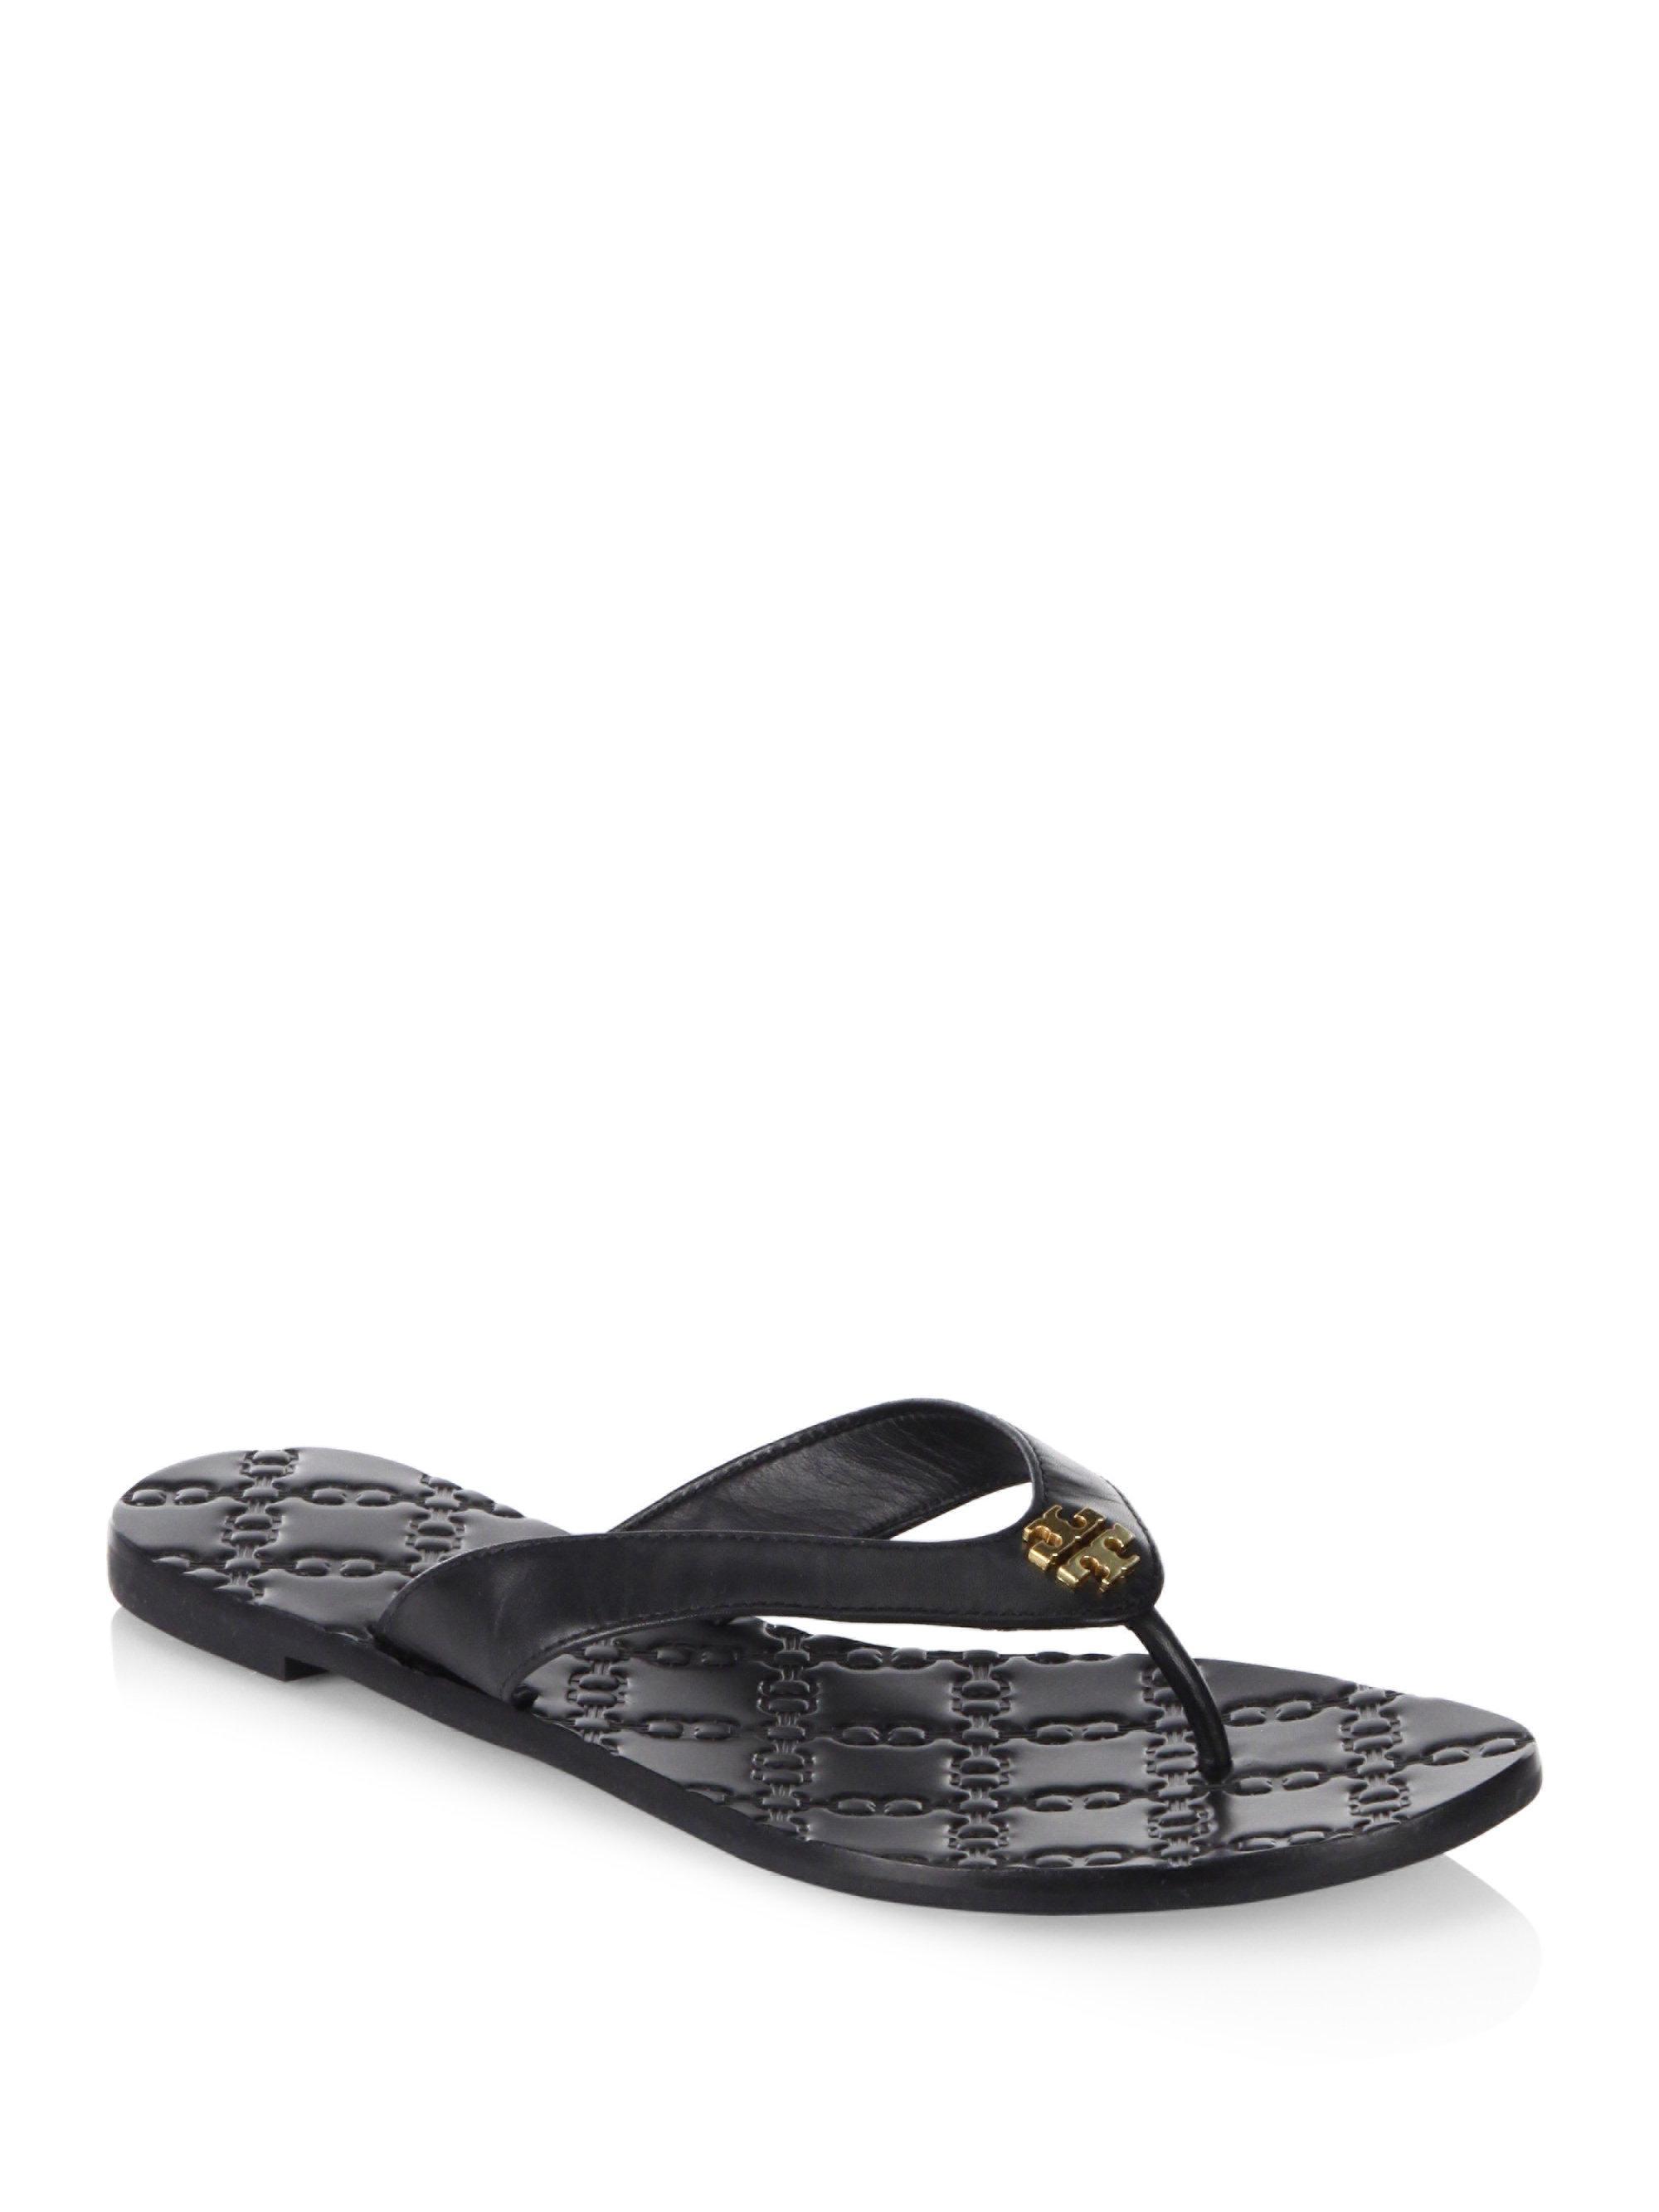 3f310825bdb Lyst - Tory Burch Monroe Leather Thong Sandals in Black